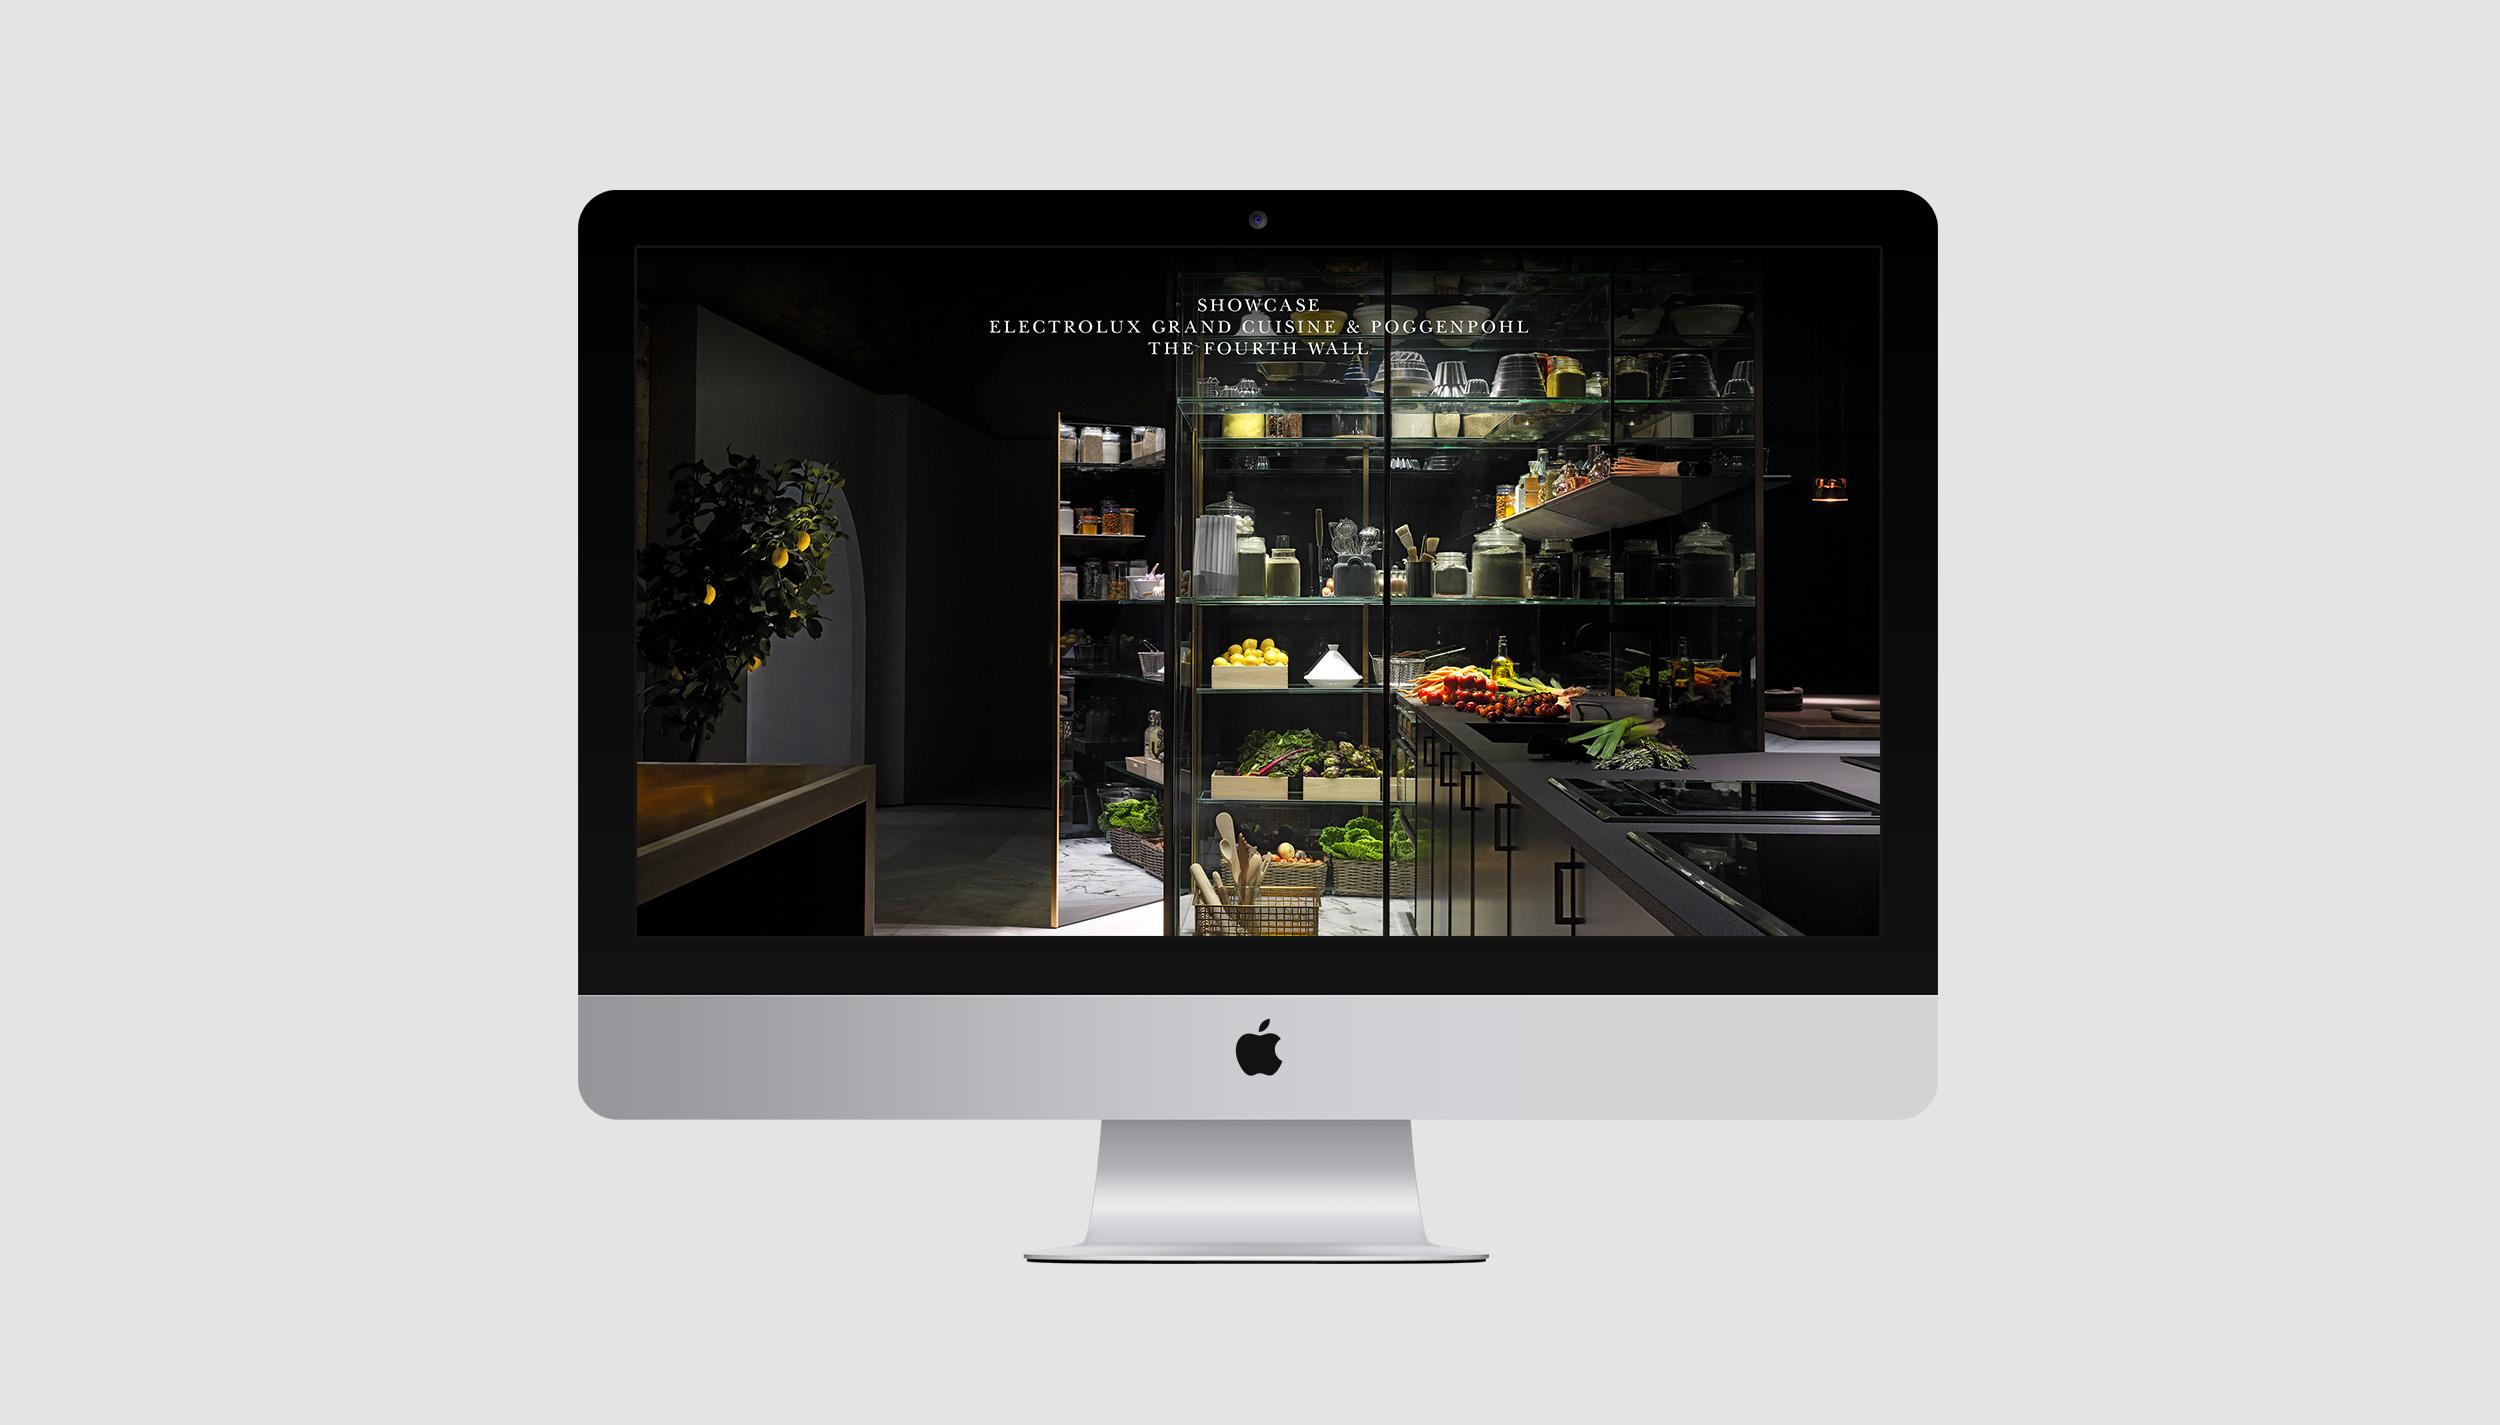 Anders Nord_Electrolux_Grand Cuisine_20.jpg